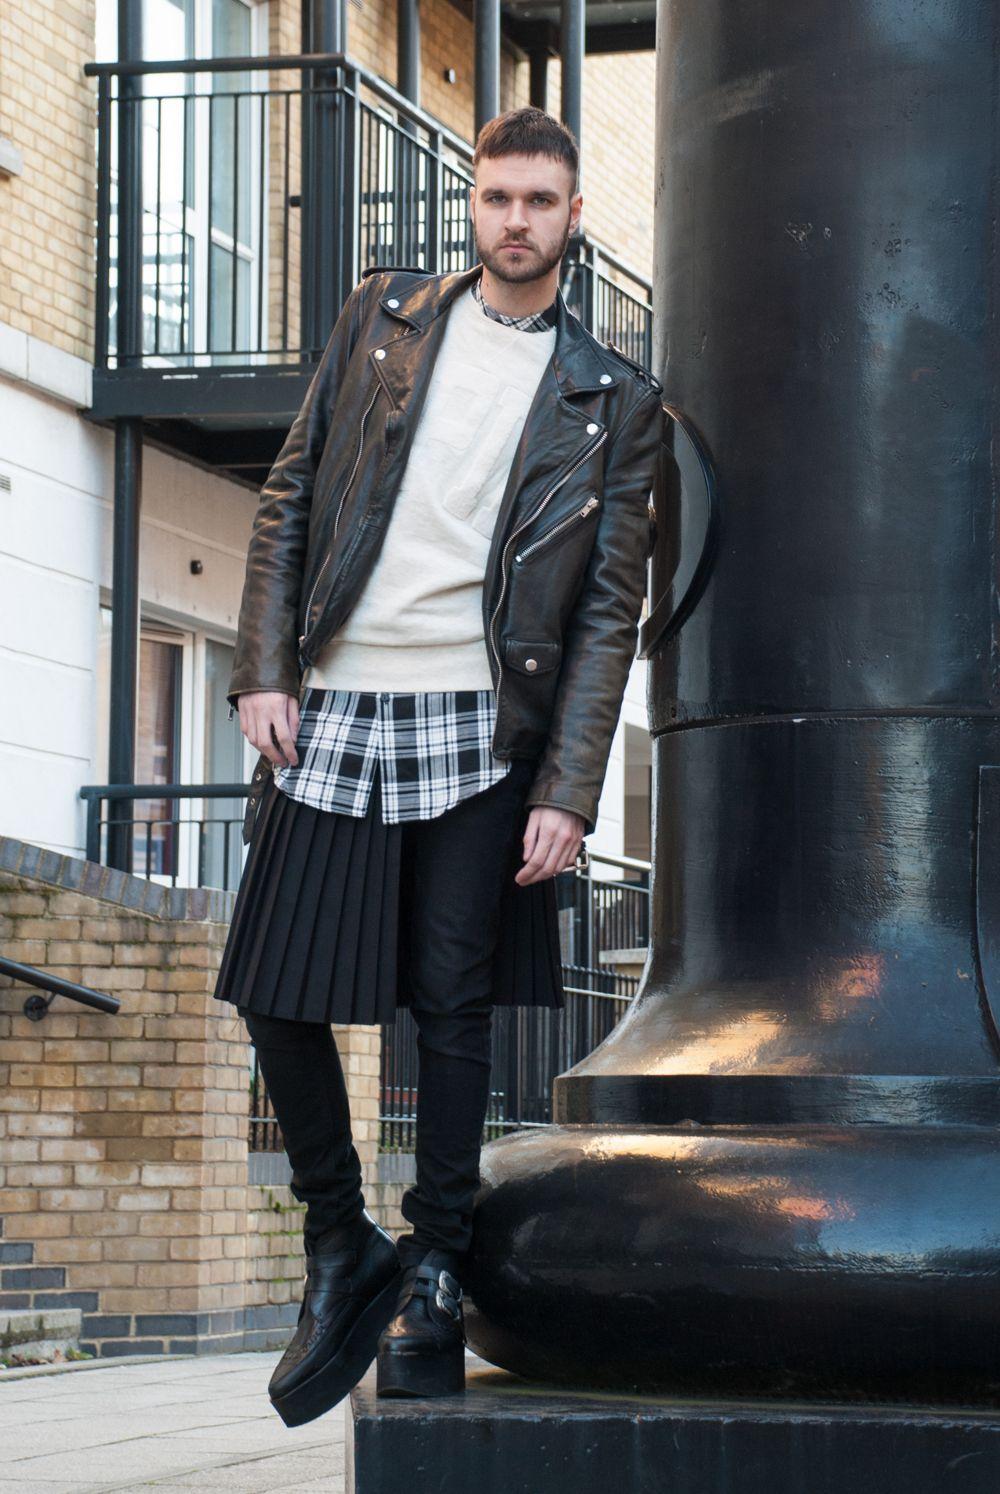 Men's Black Leather Biker Jacket, Beige Crewneck Sweater